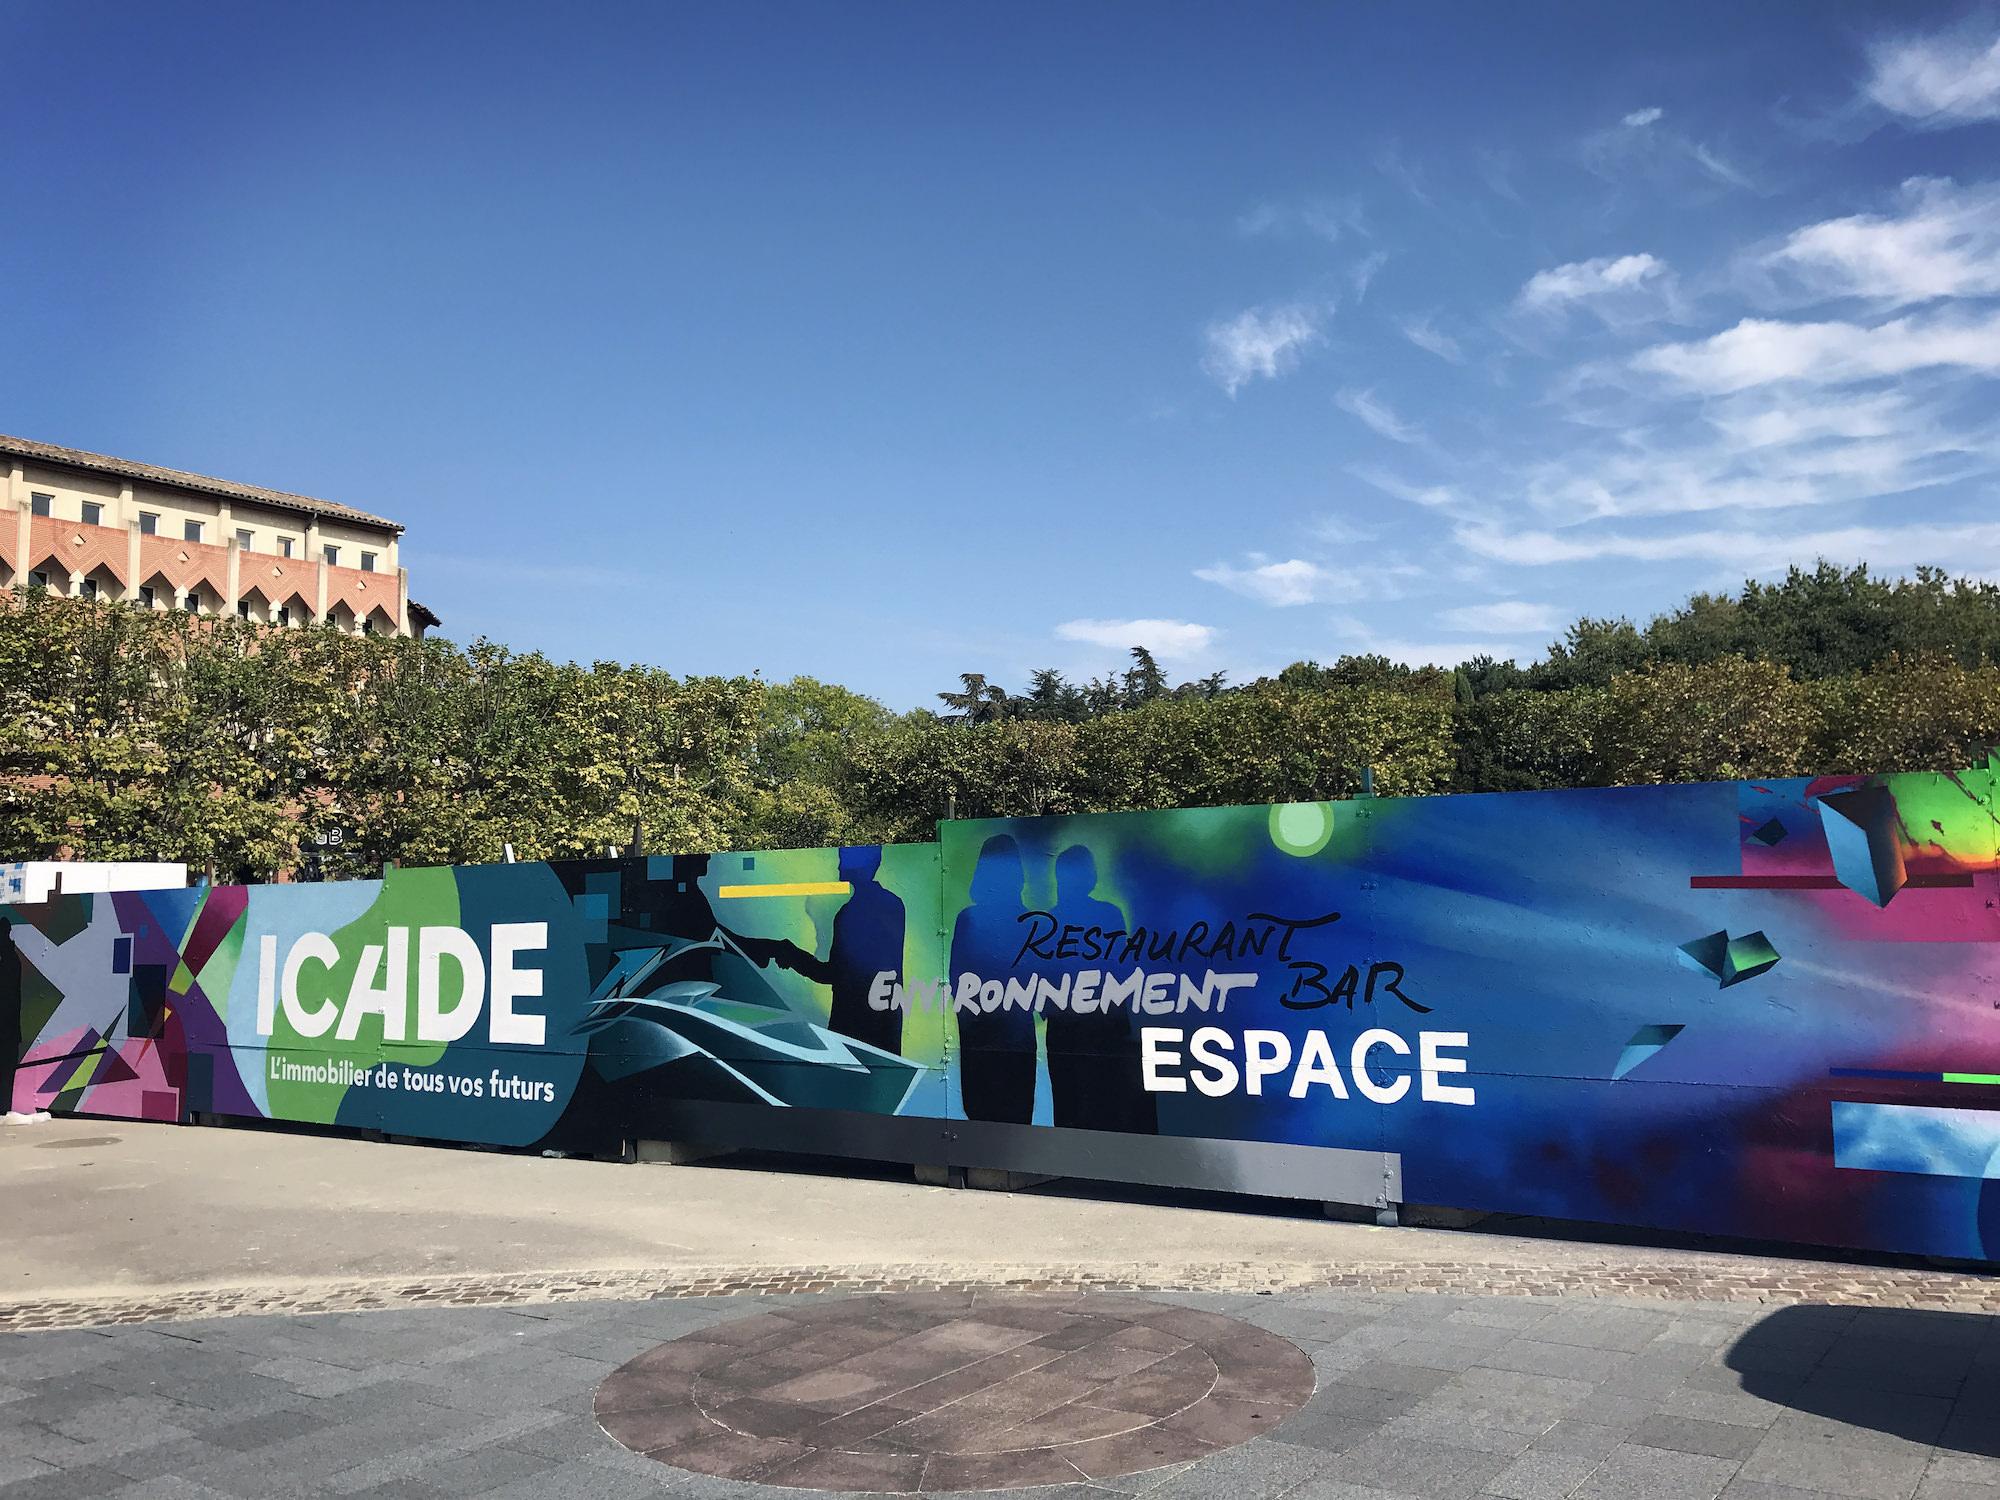 fresque streetart immobilier graffiti toulouse icade halltimes